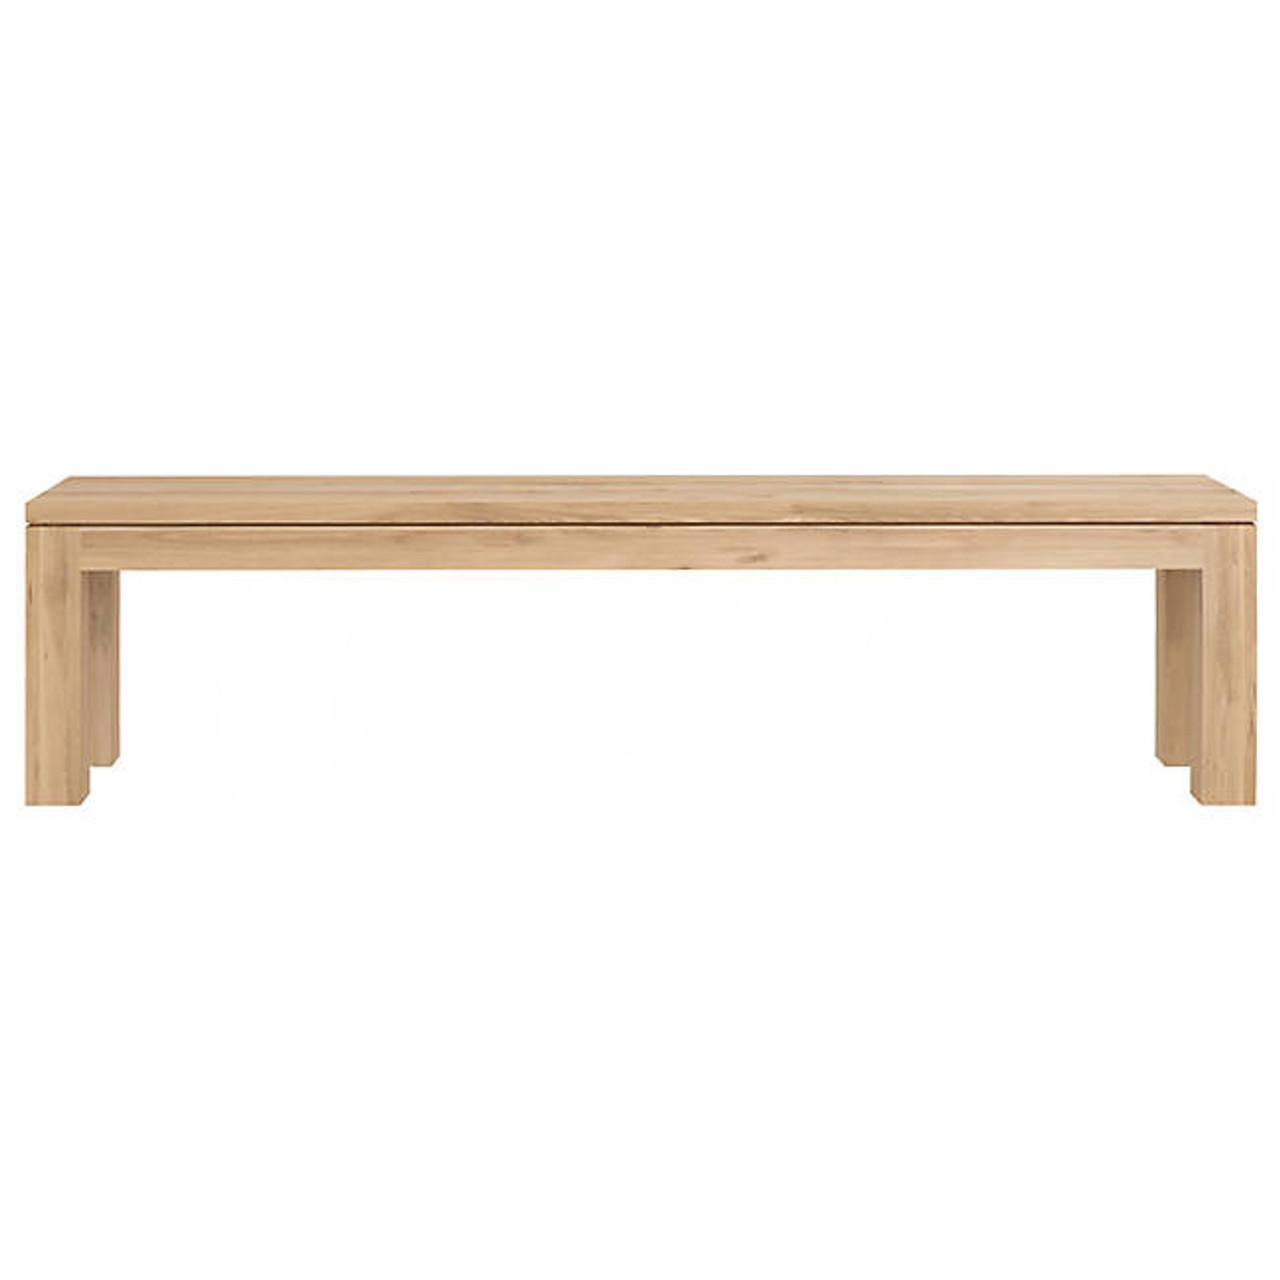 Oak Straight Dining Bench